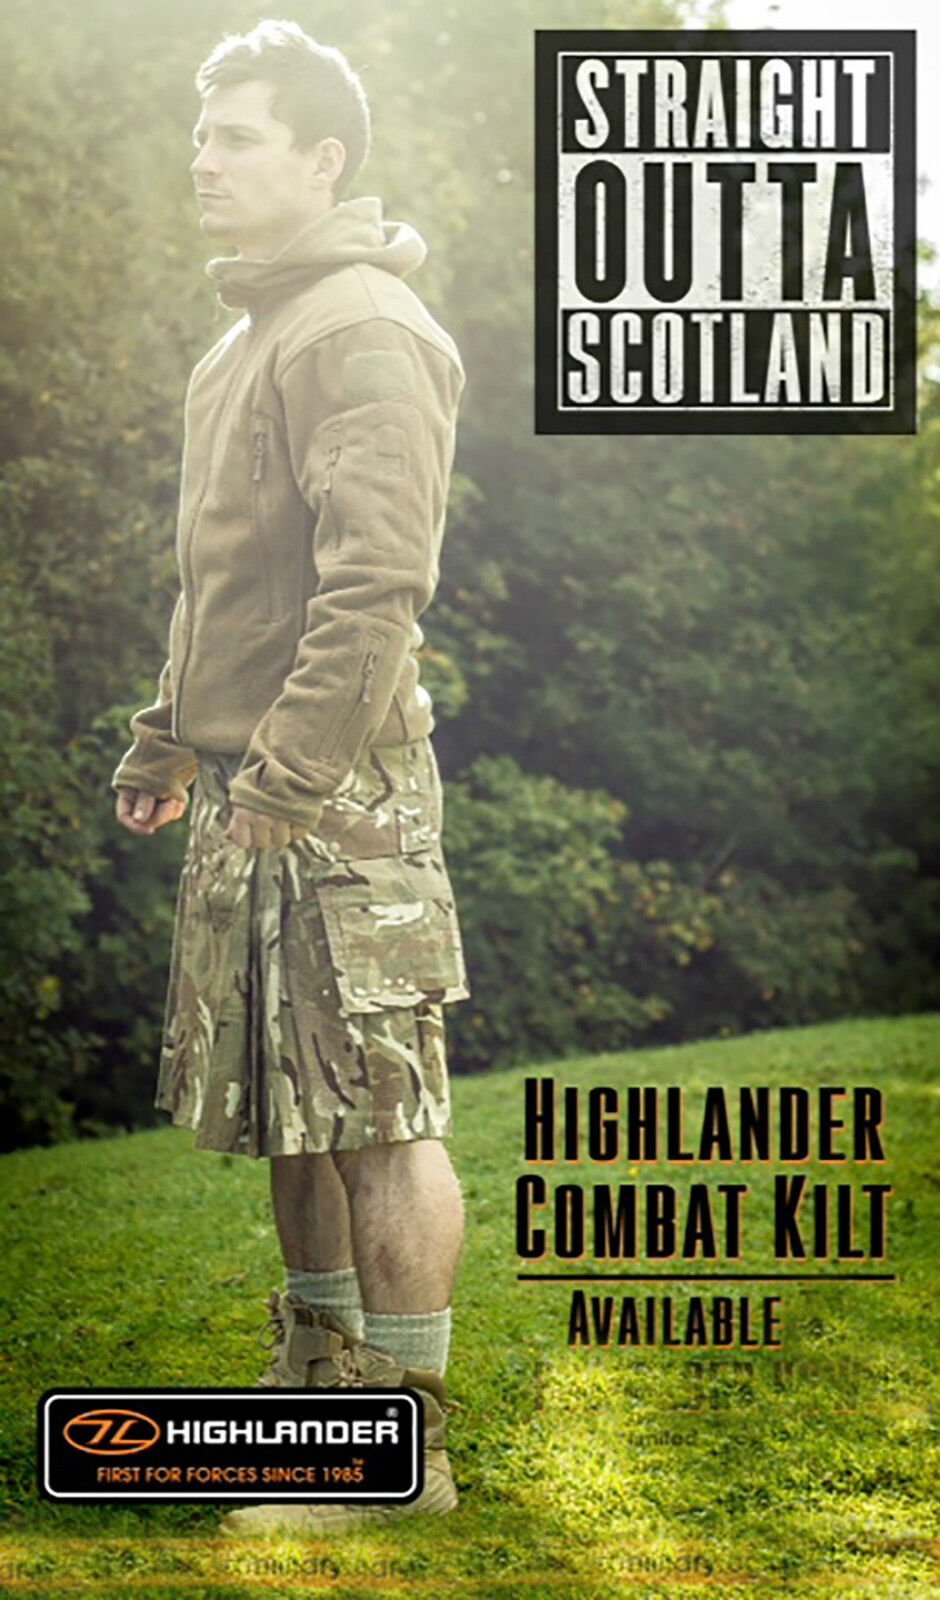 New Highlander Black / MTP / Multicam Match Combat Kilt - Tactical Combat Kilt